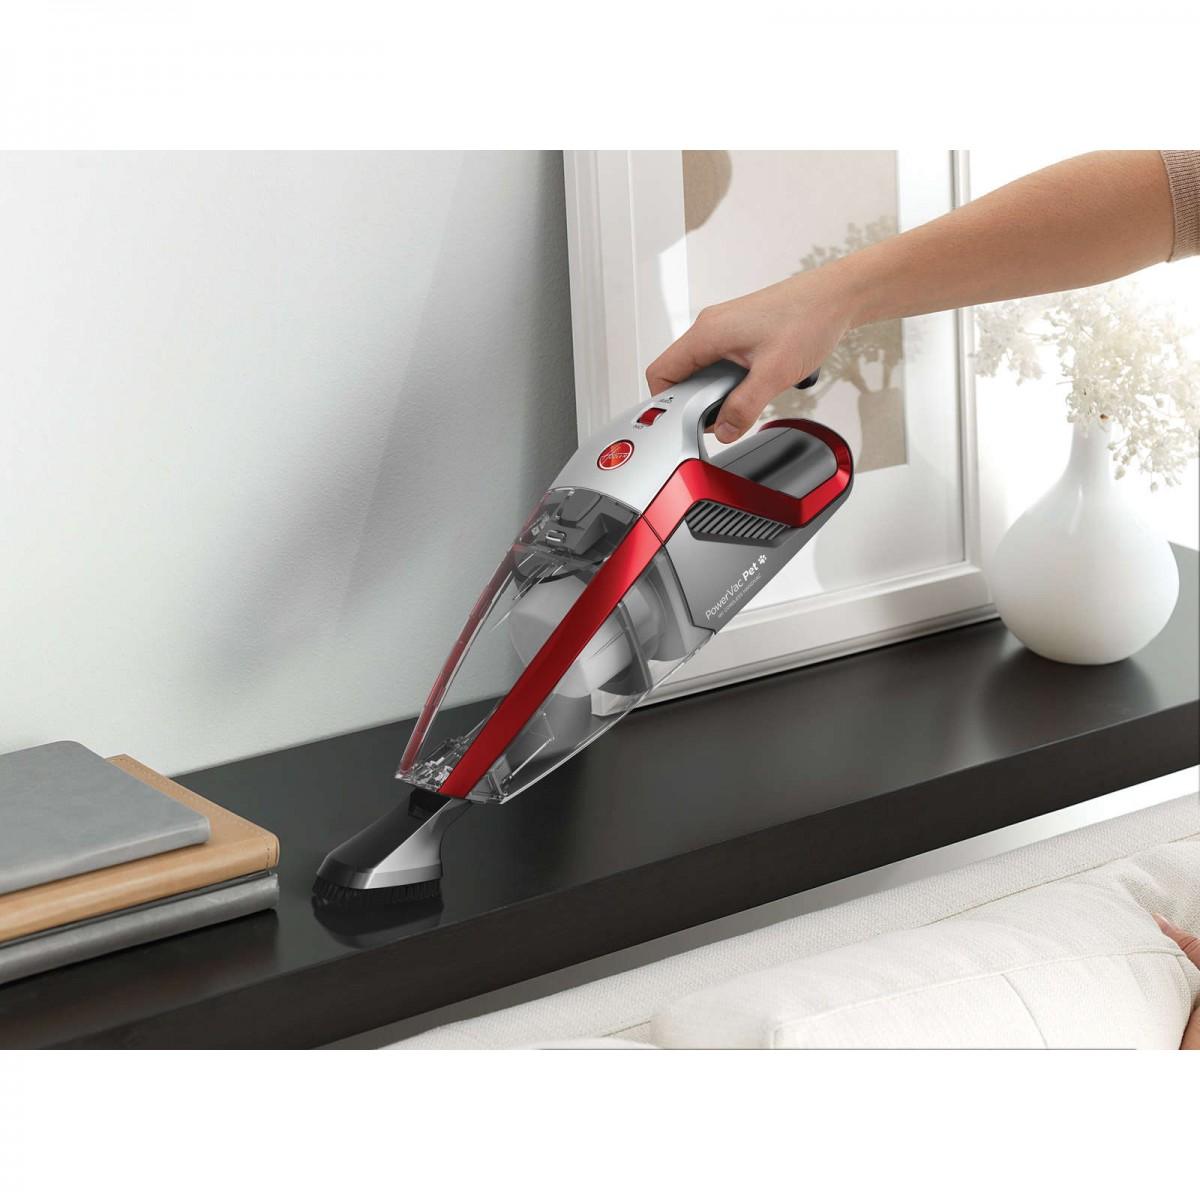 aspirateur a main sans fil hoover 18volts nimh bh10100. Black Bedroom Furniture Sets. Home Design Ideas